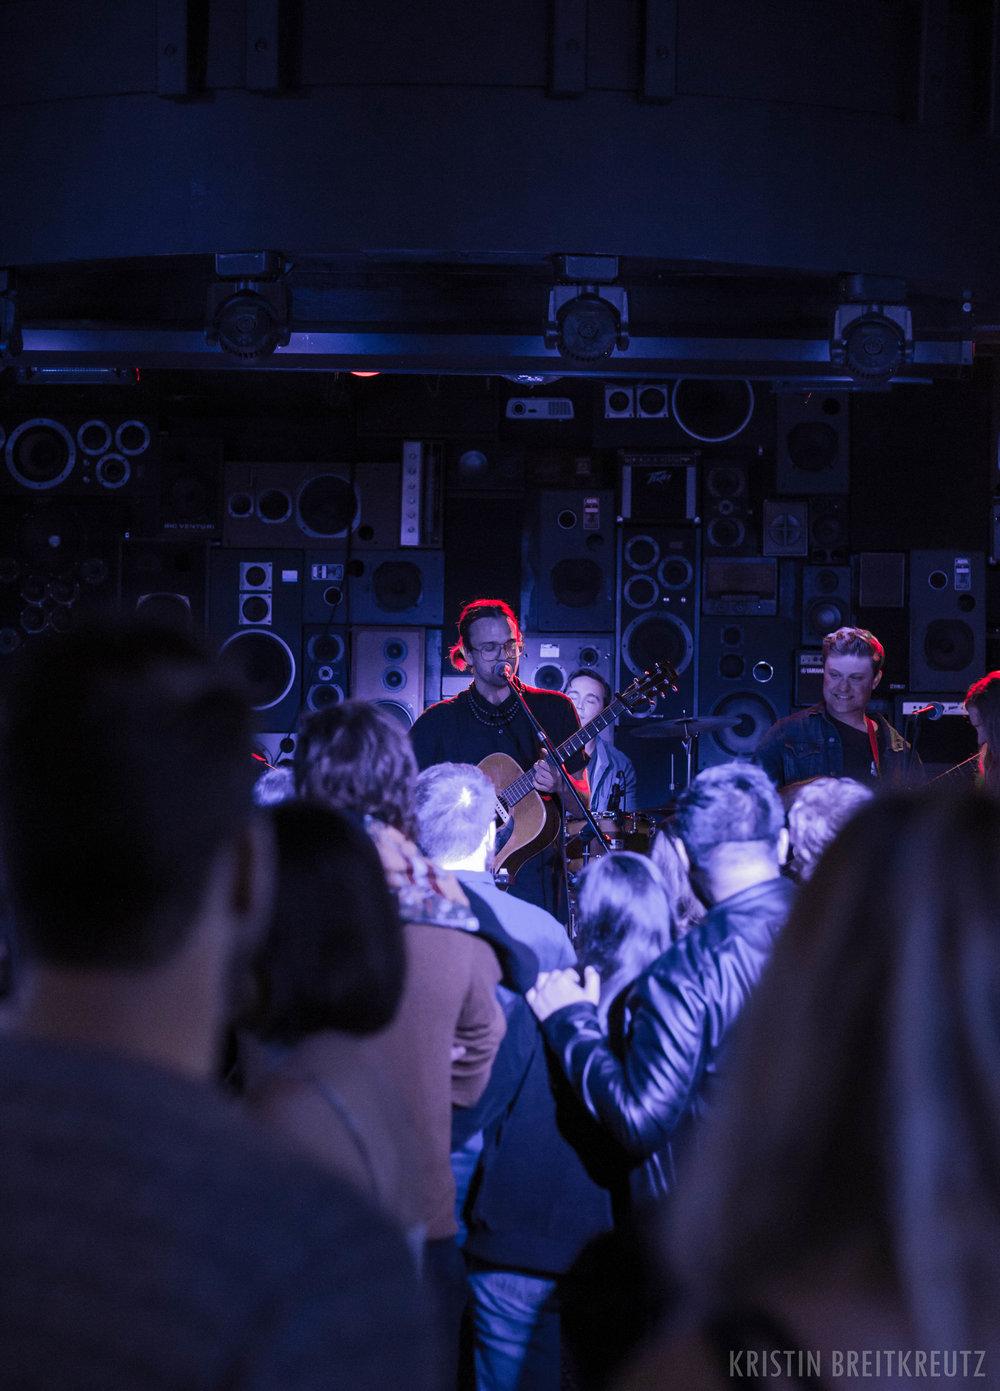 Sheldoncole @ Studio Nightclub